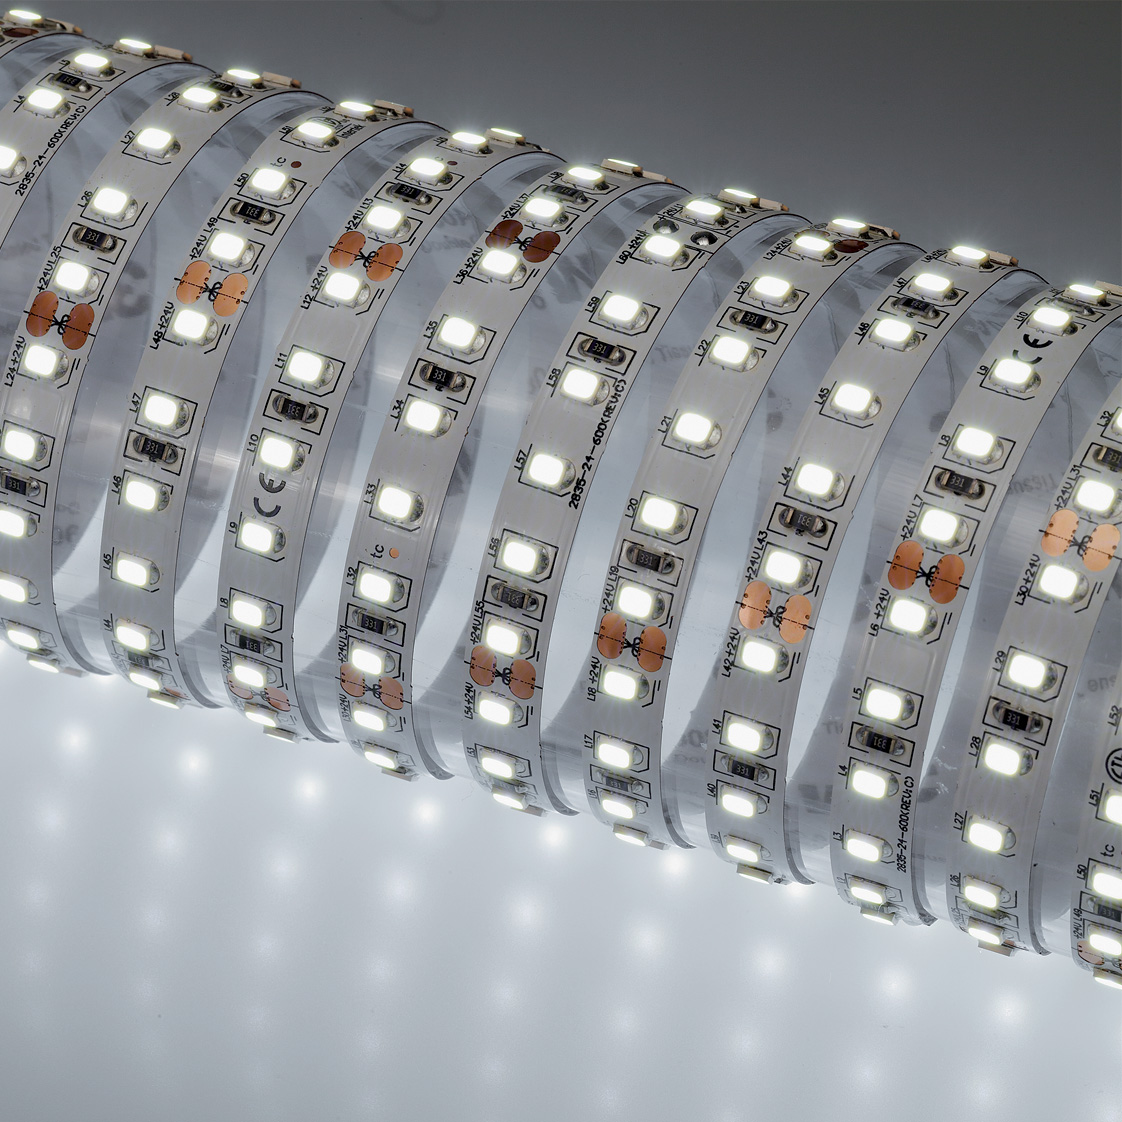 Indoor LED strip - 70002                                                                                                                                                                                                                                                   NEW